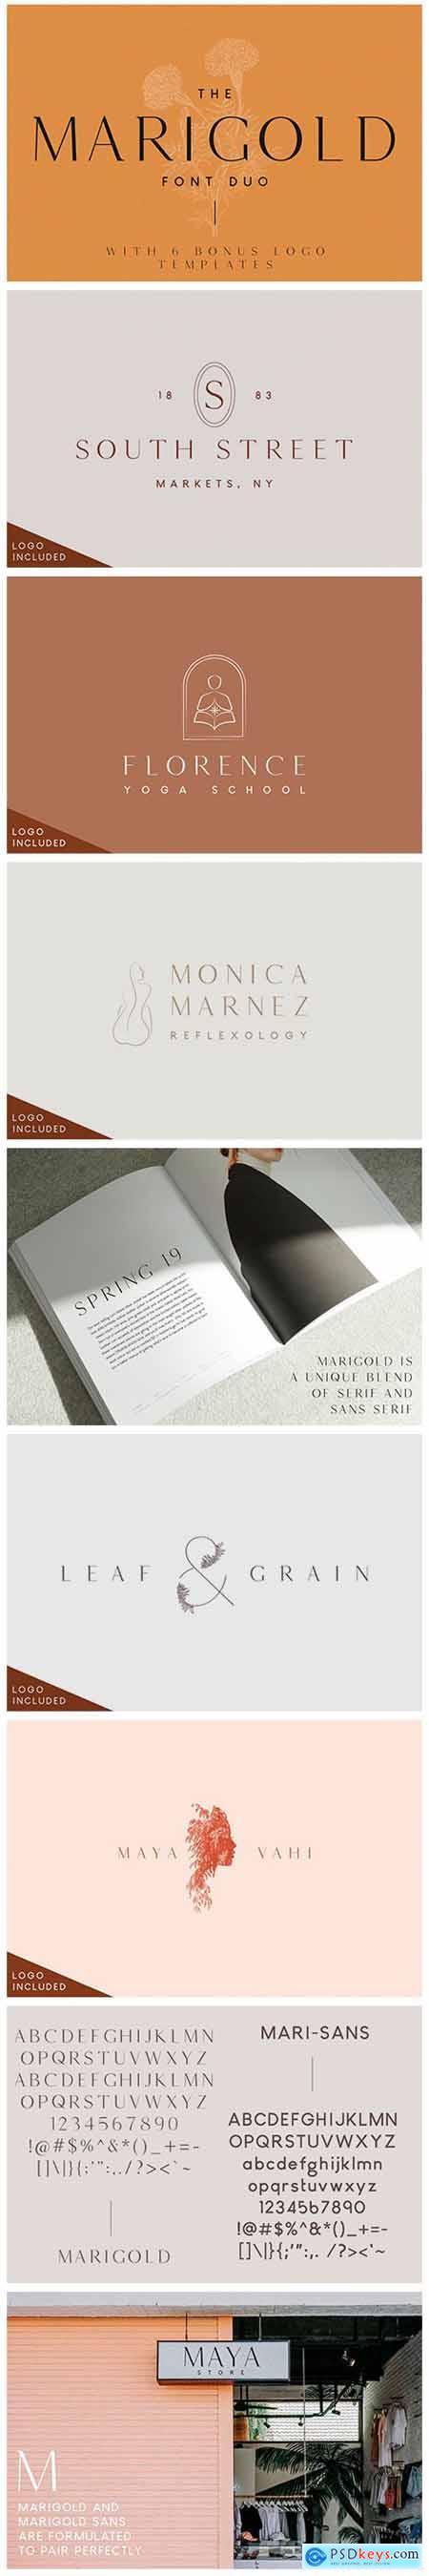 Marigold - Font Duo and Logo Set 3771869